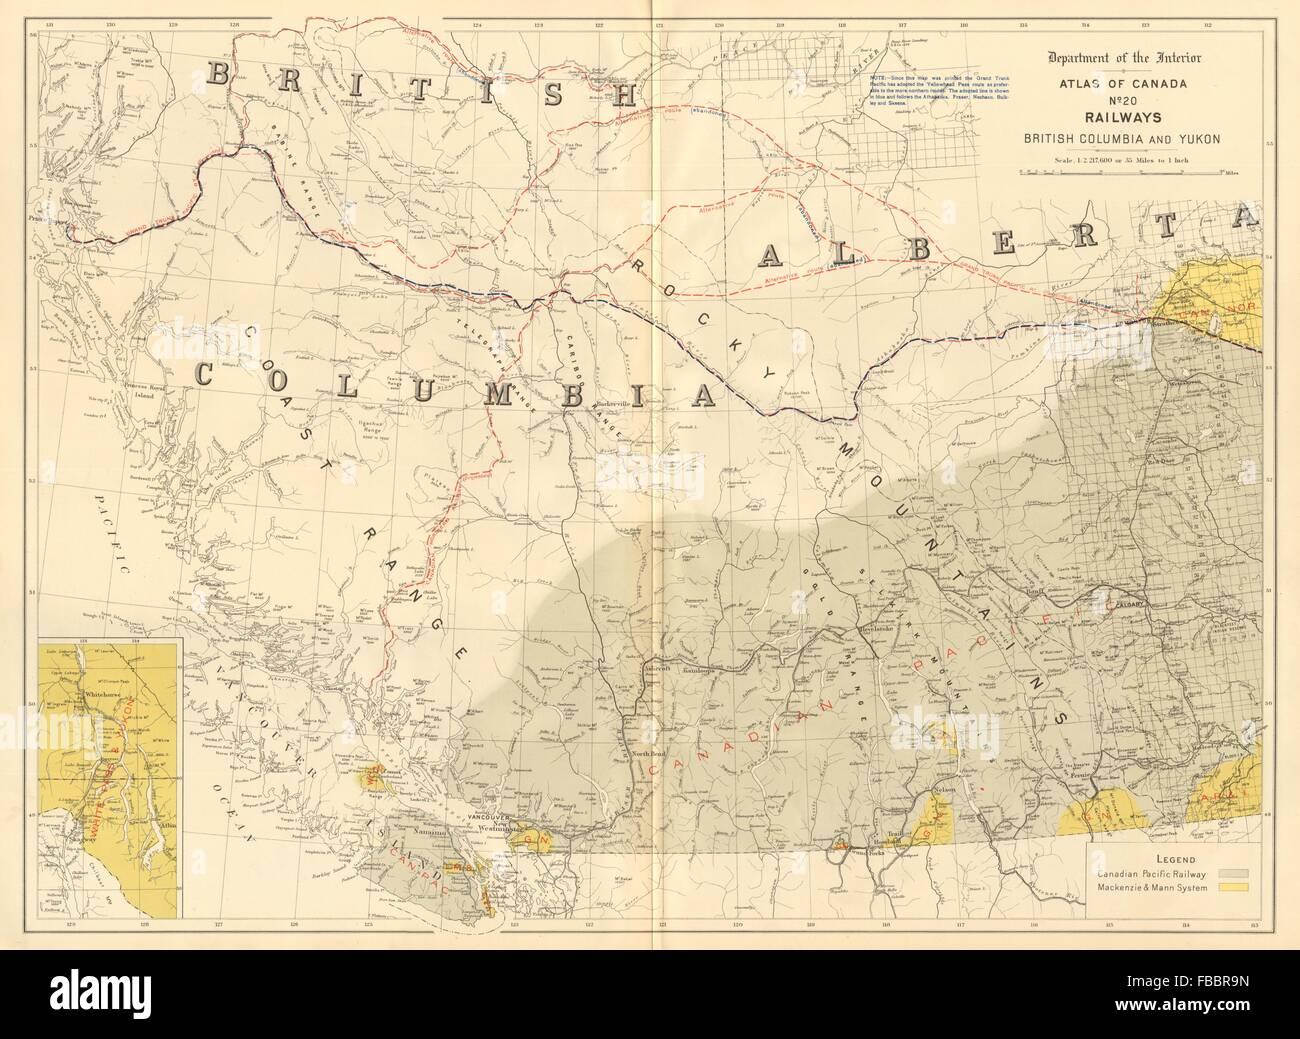 Canada railways british columbia yukon canadian pacific stock british columbia yukon canadian pacific mackenzie 1906 map gumiabroncs Image collections